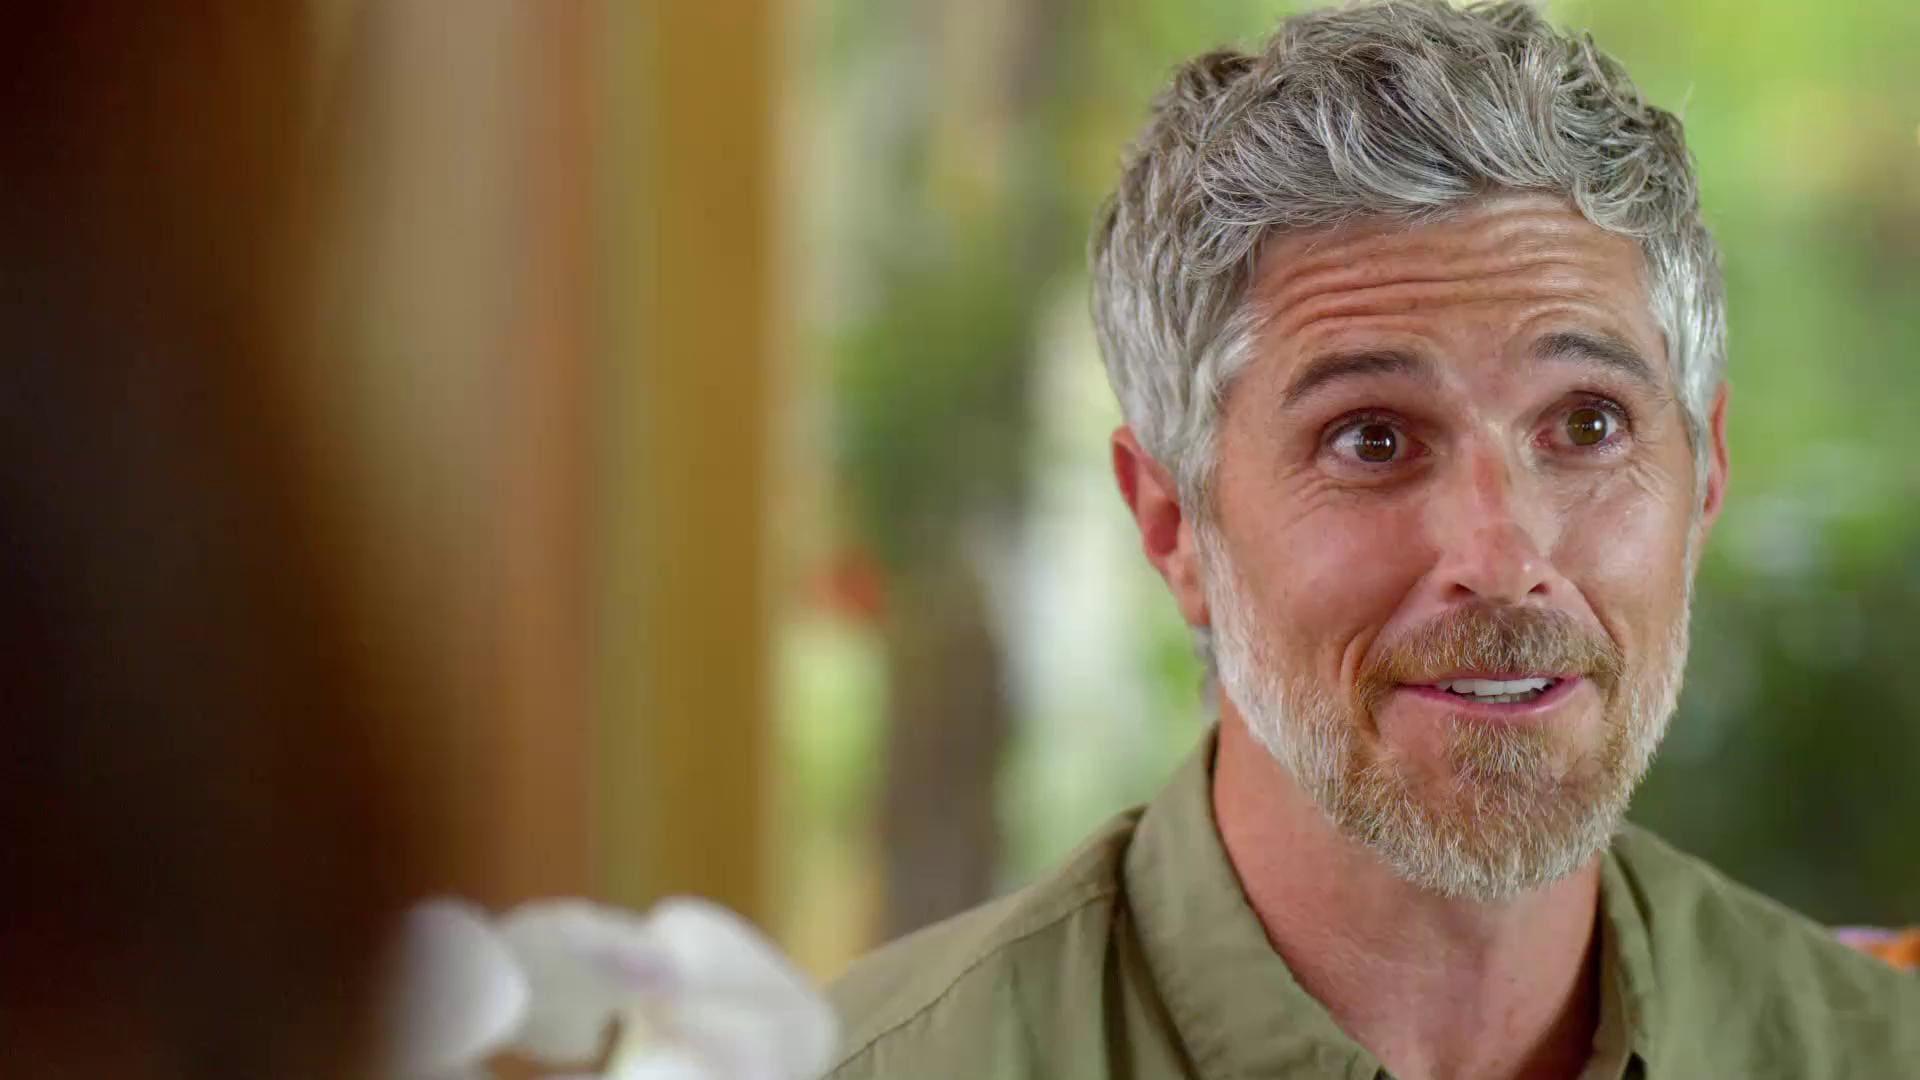 Fantasy Island | Watch New Episodes Tuesdays at 9/8c on FOX